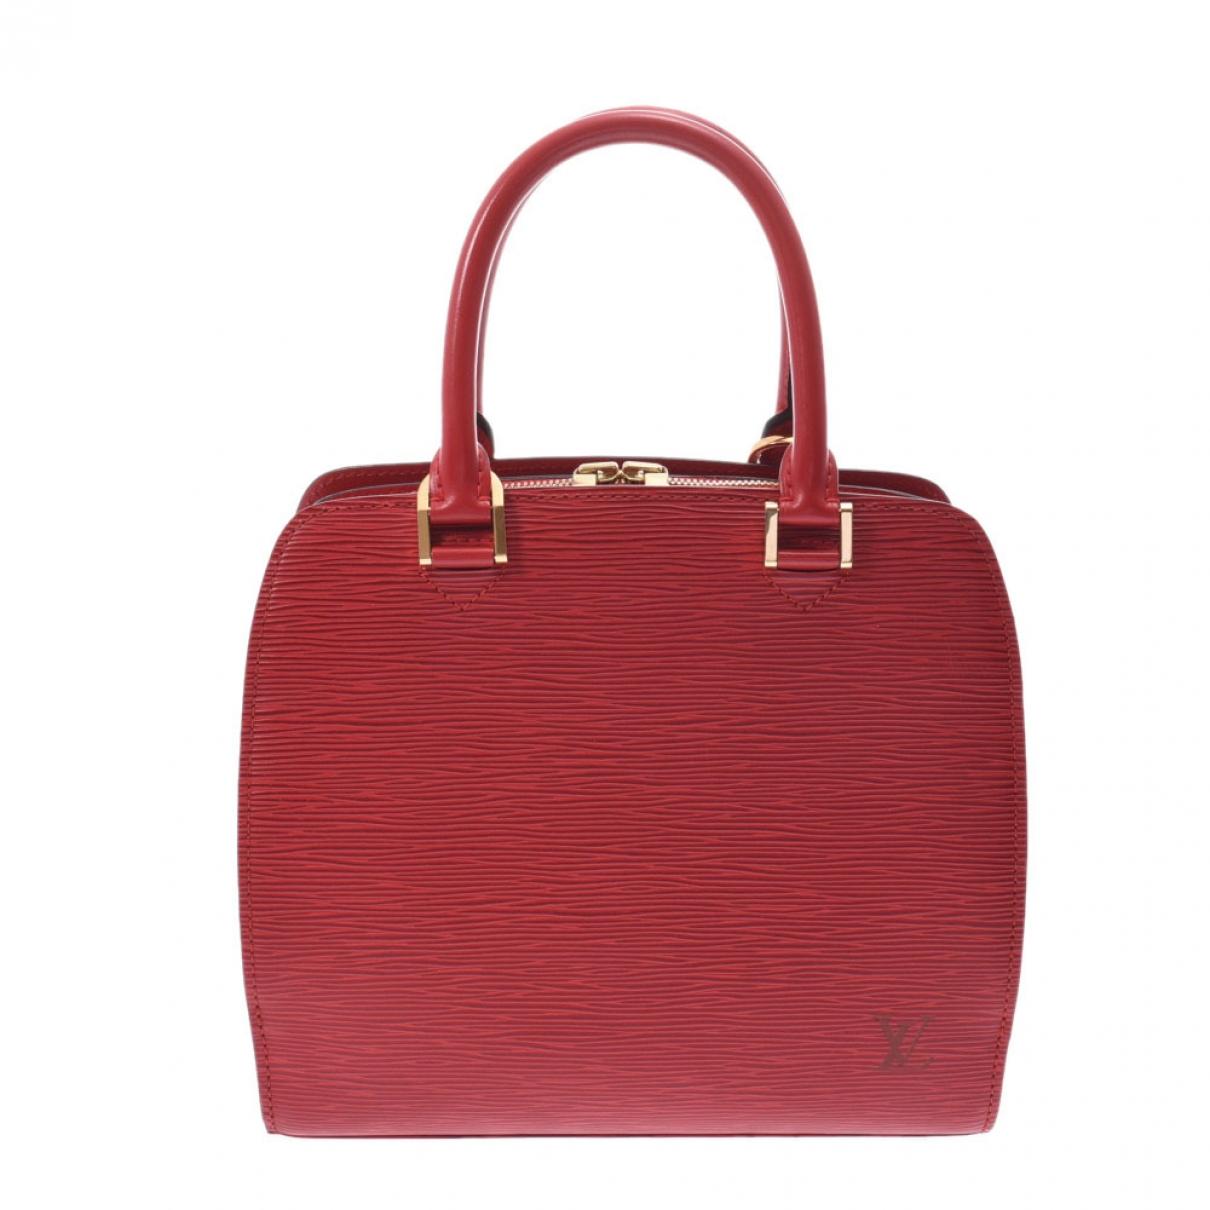 Bolso  Pont Neuf Vintage  de Cuero Louis Vuitton